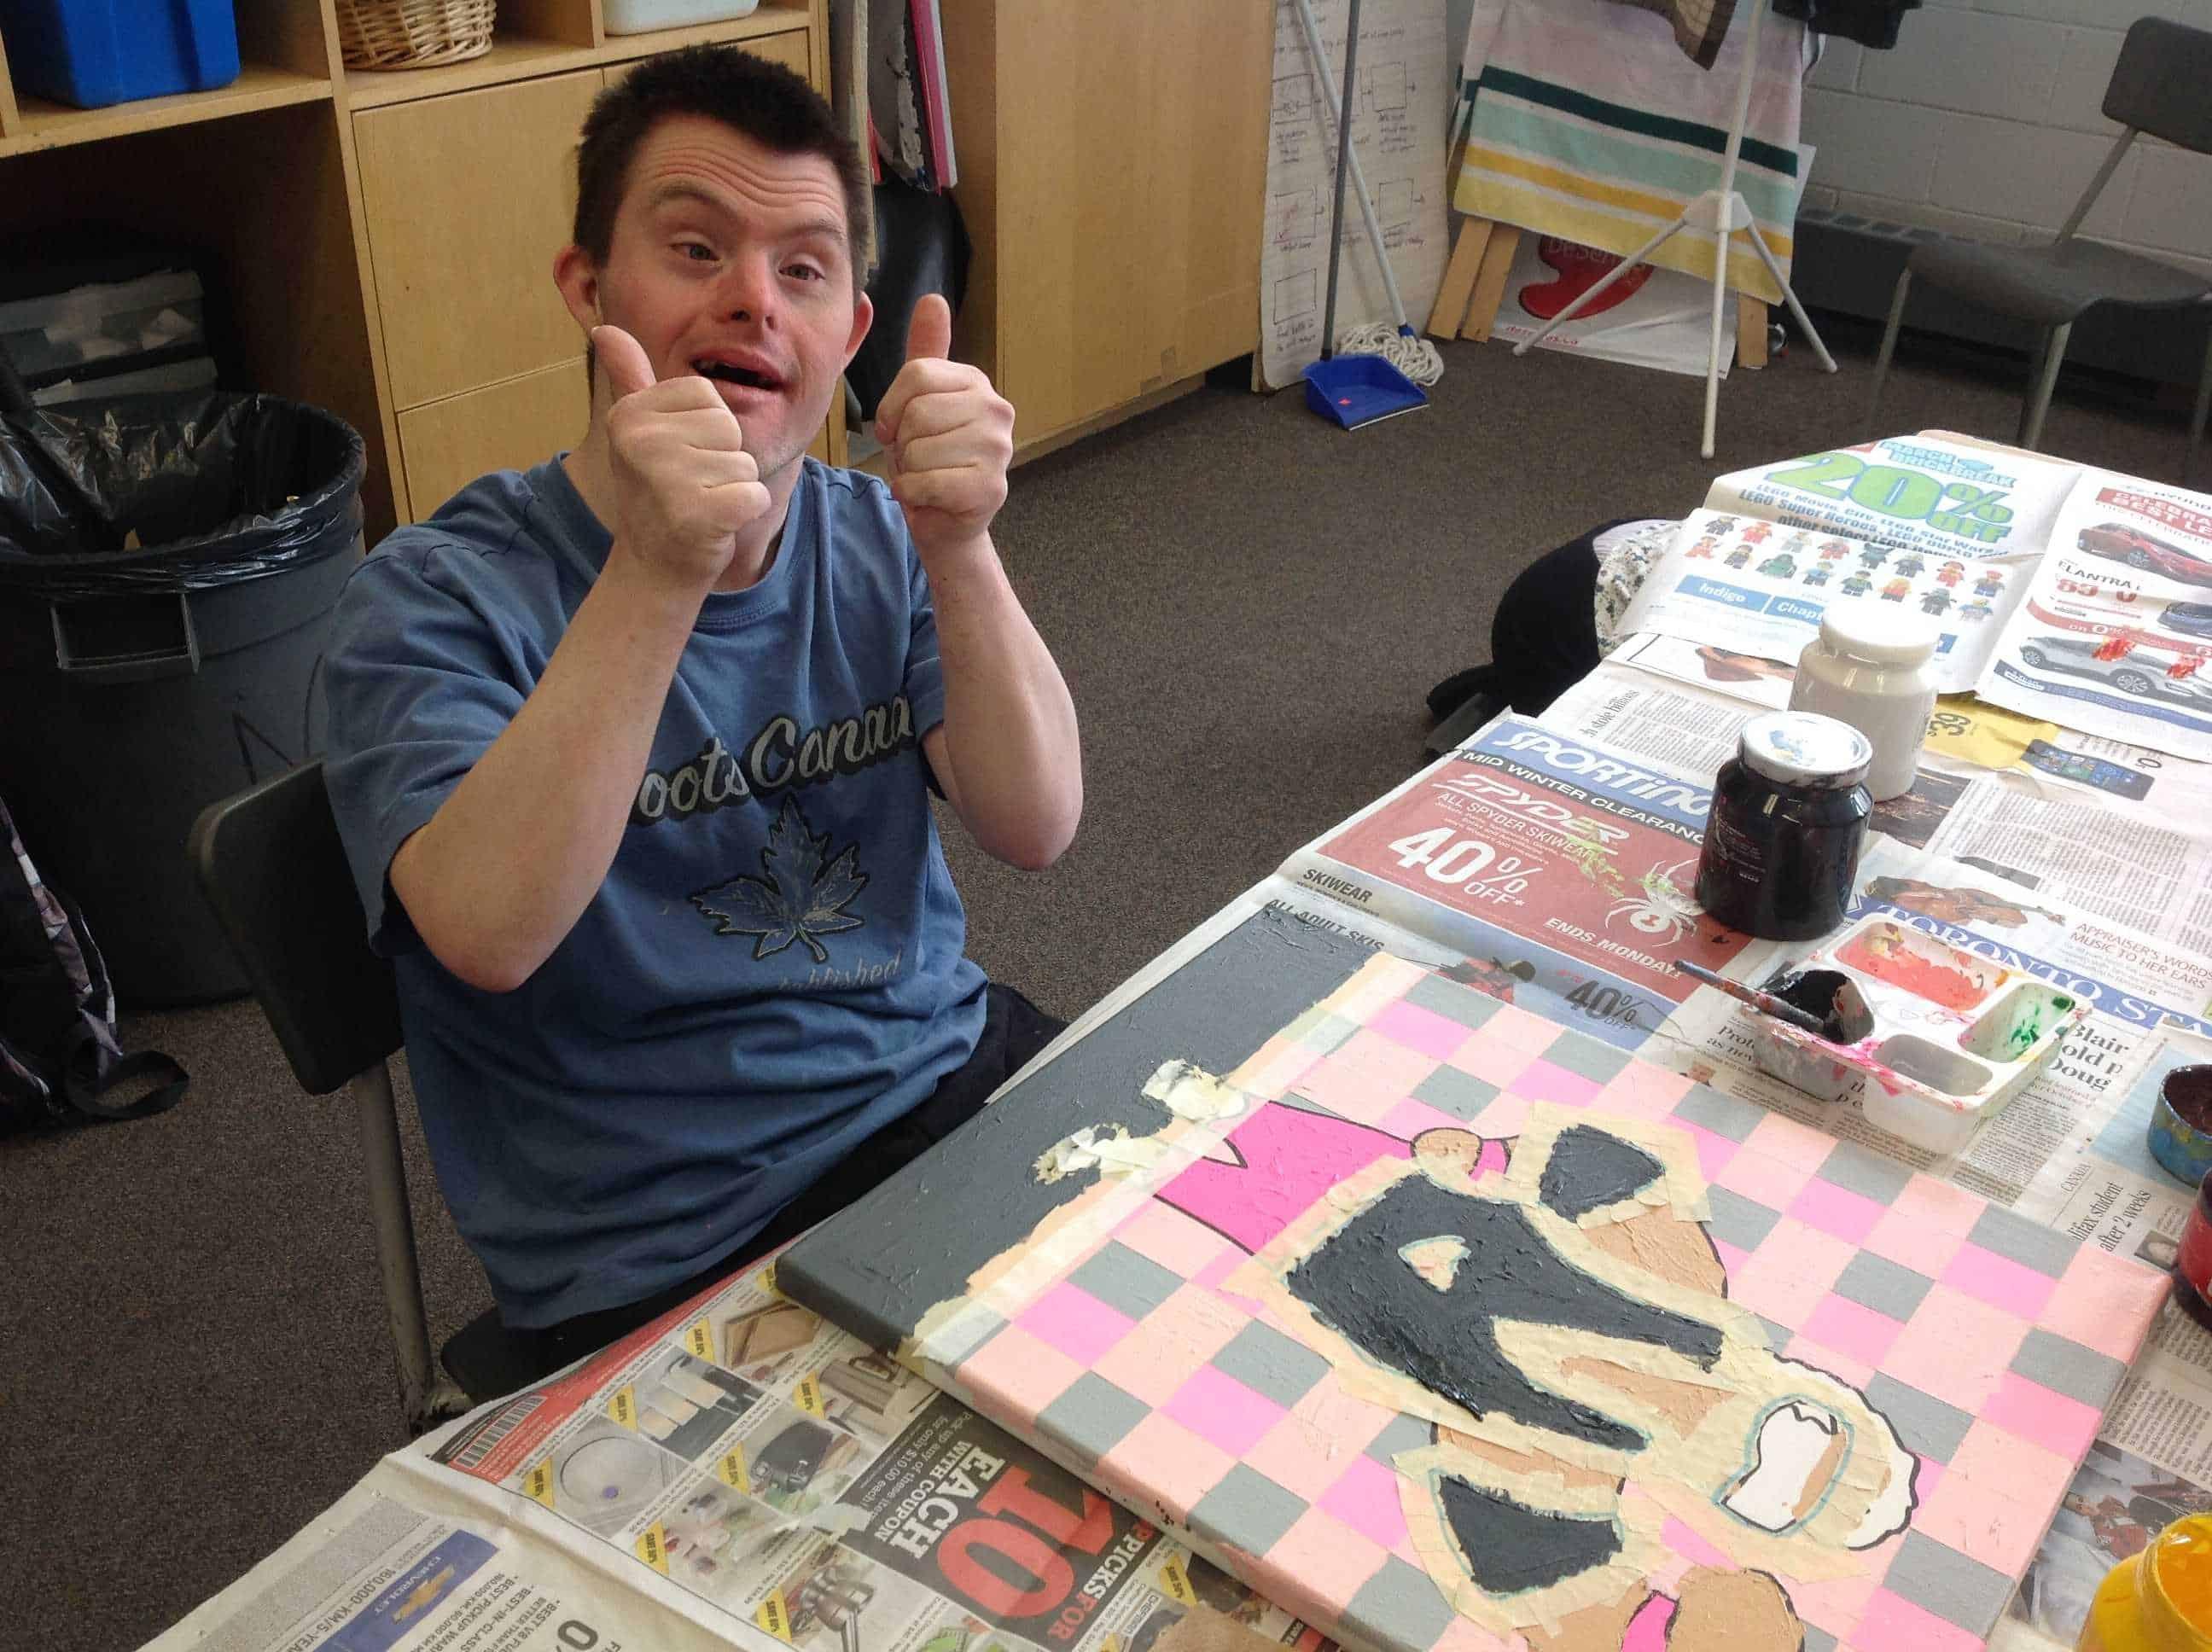 Addus Art Class Participant Image French Page